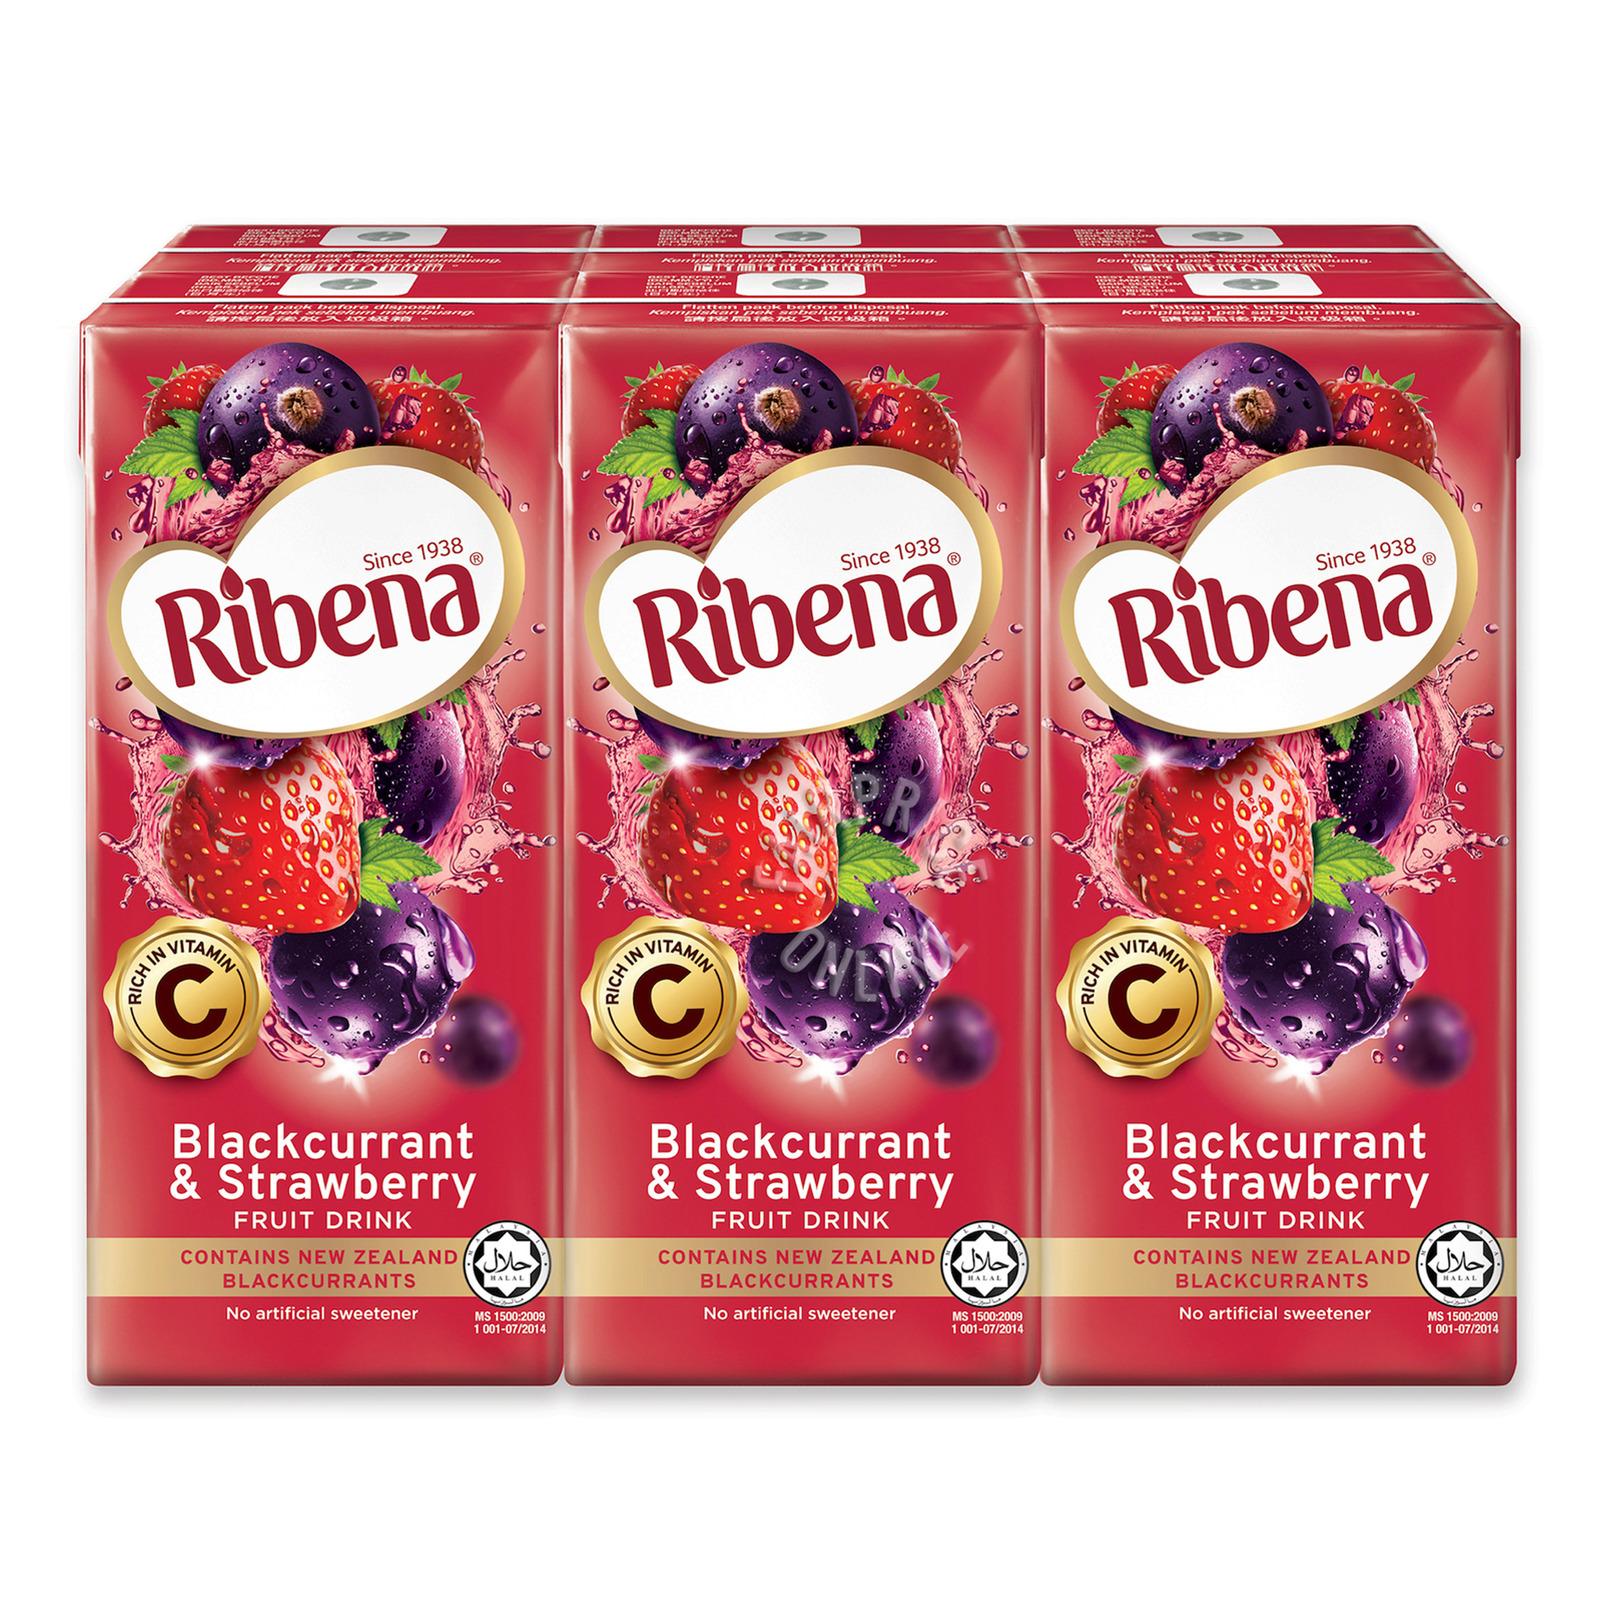 Ribena Blackcurrant Fruit Packet Drink - Strawberry